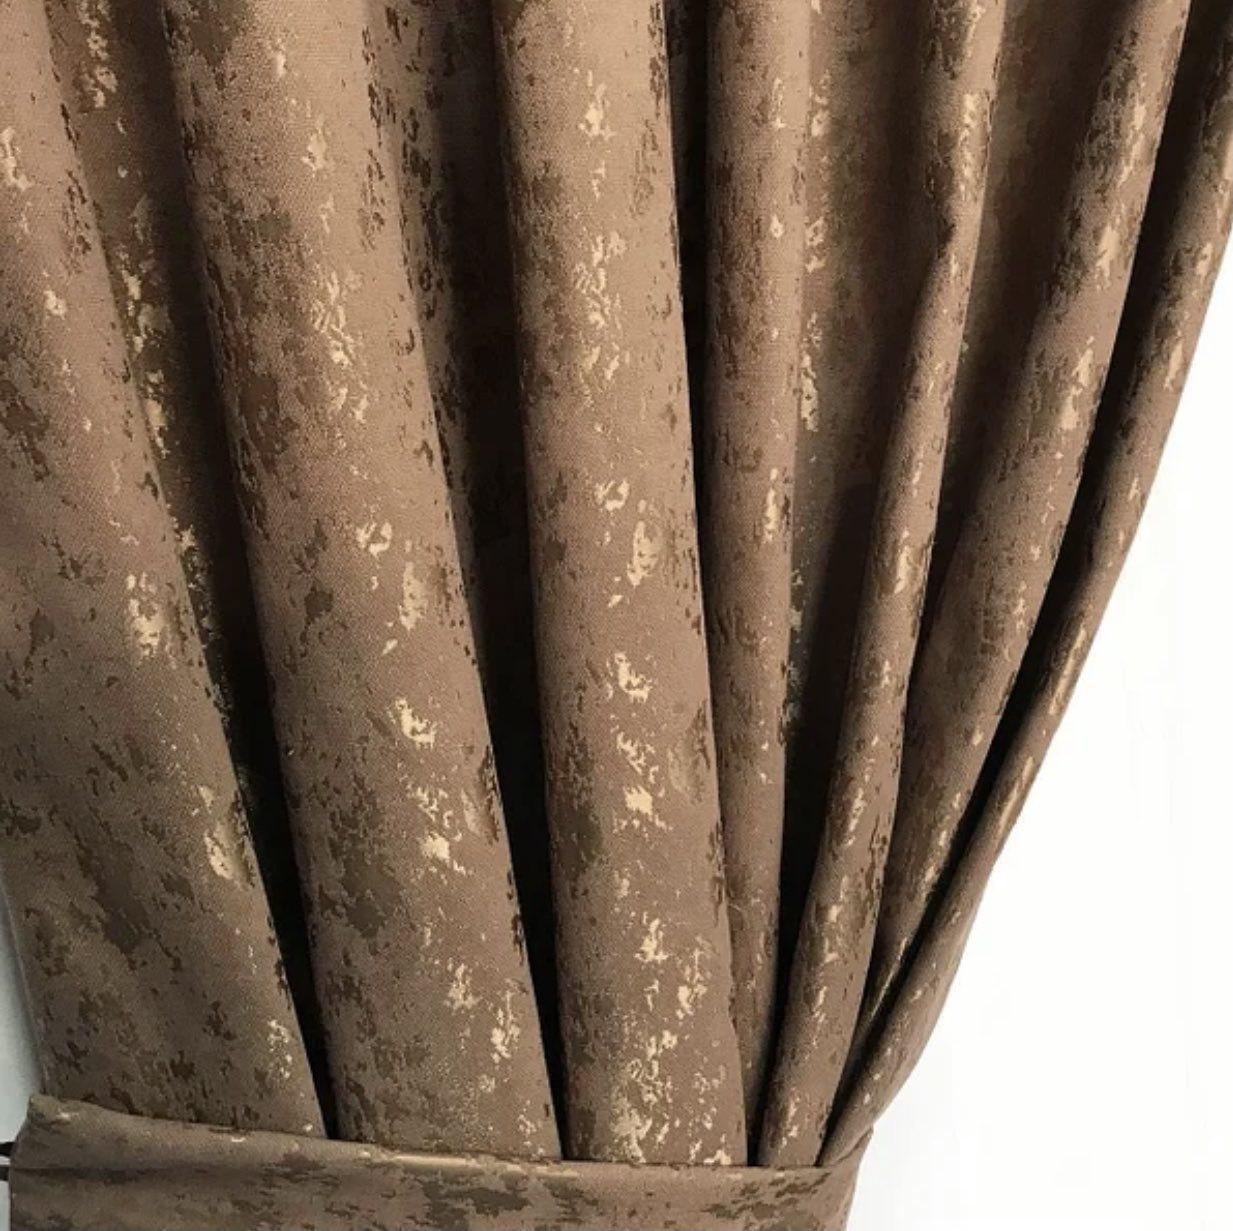 Комплект мраморных штор Готовые мраморные шторы Шторы с подхватами Шторы 200х270 Цвет Коричневый